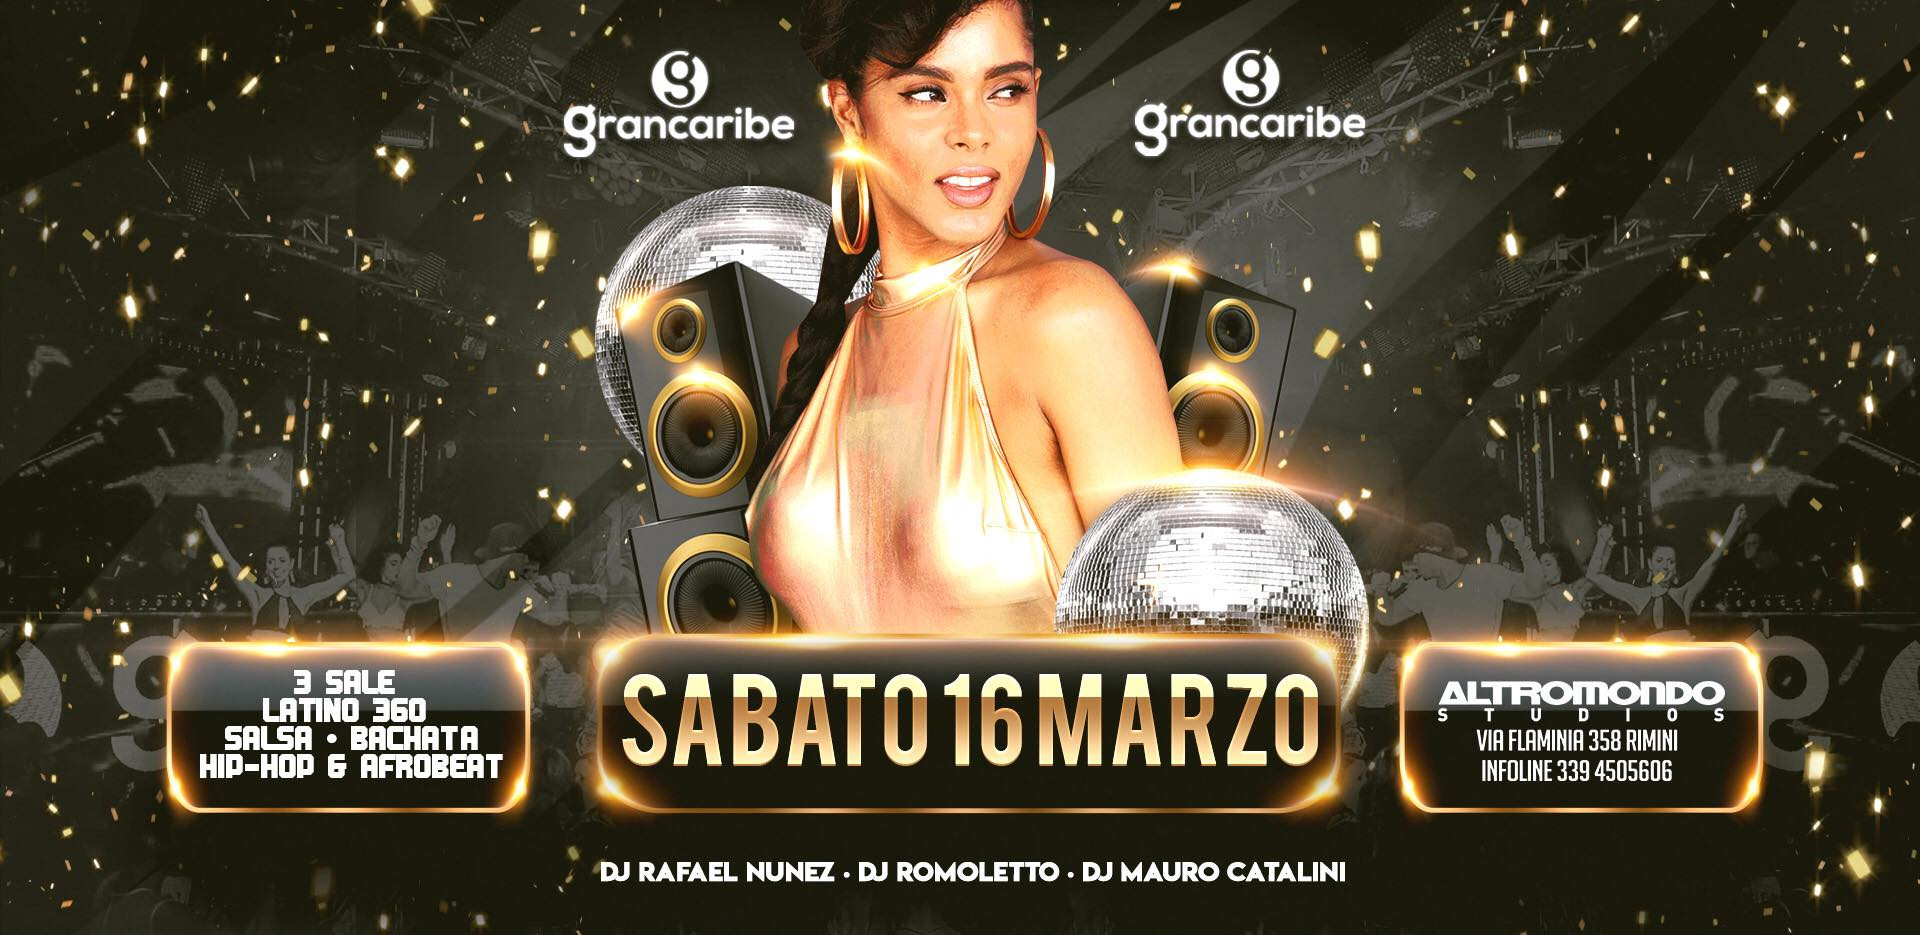 Sabato Latino Altromondo Studios Rimini